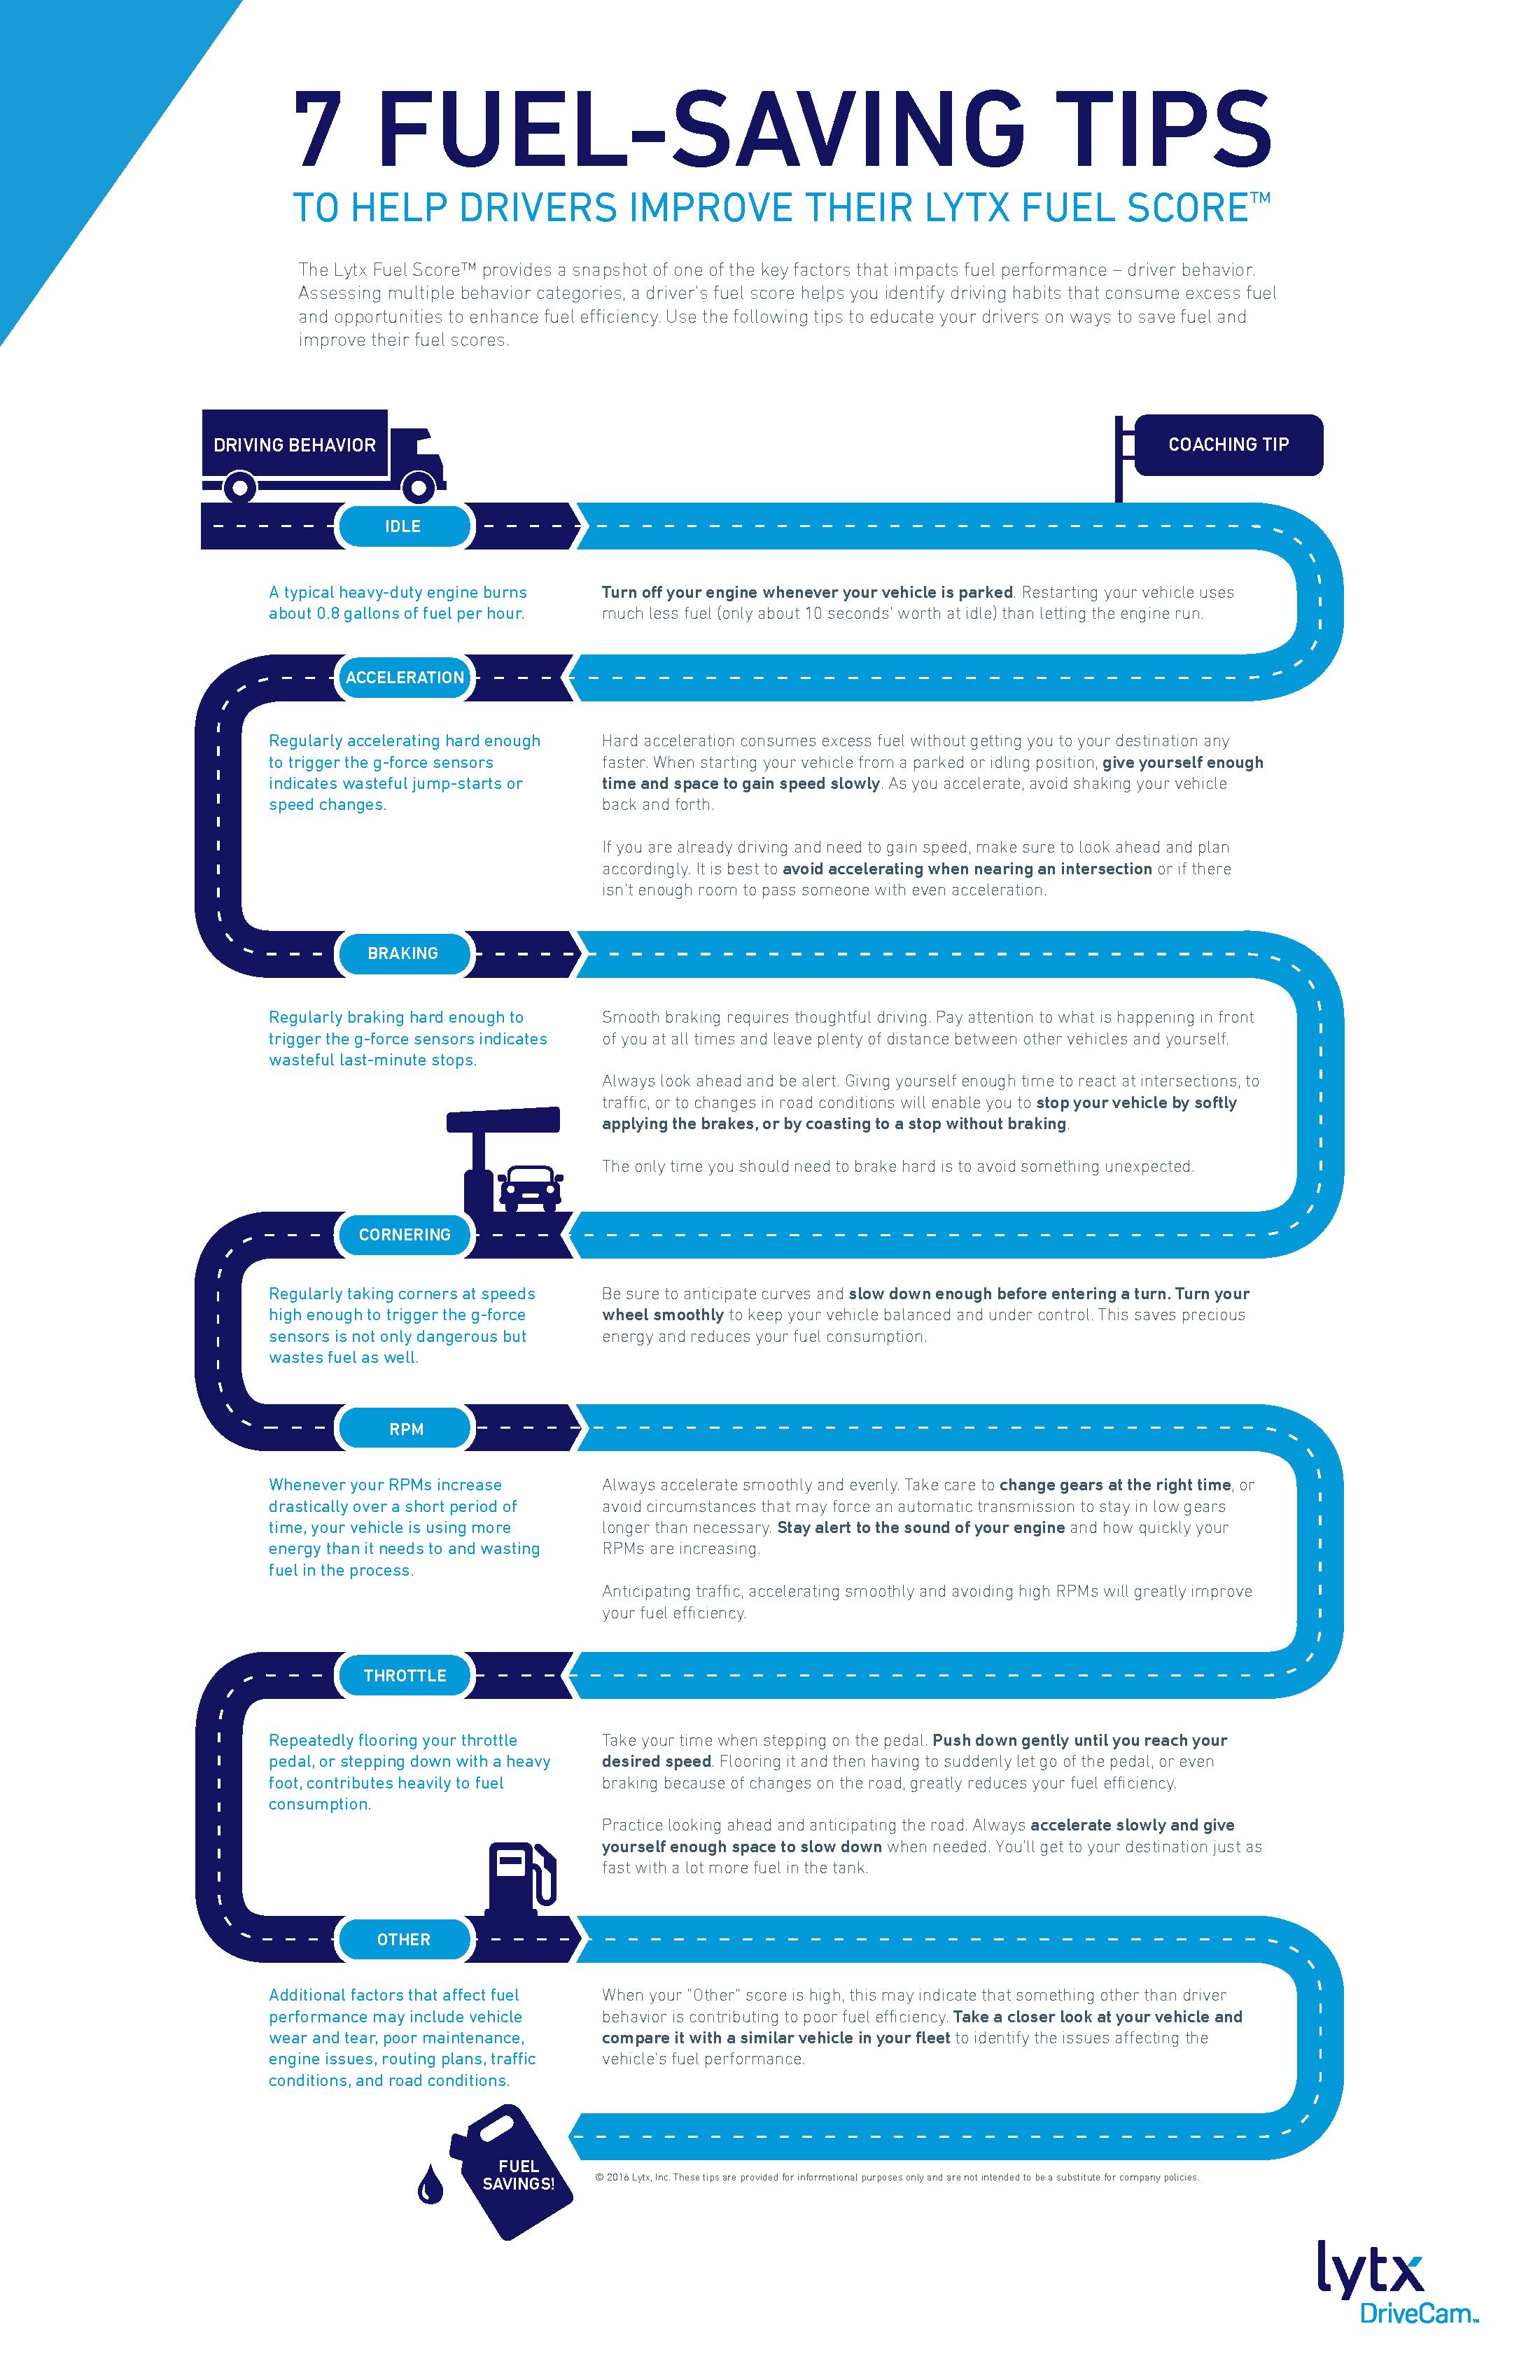 7 Fuel-Saving Tips infographic